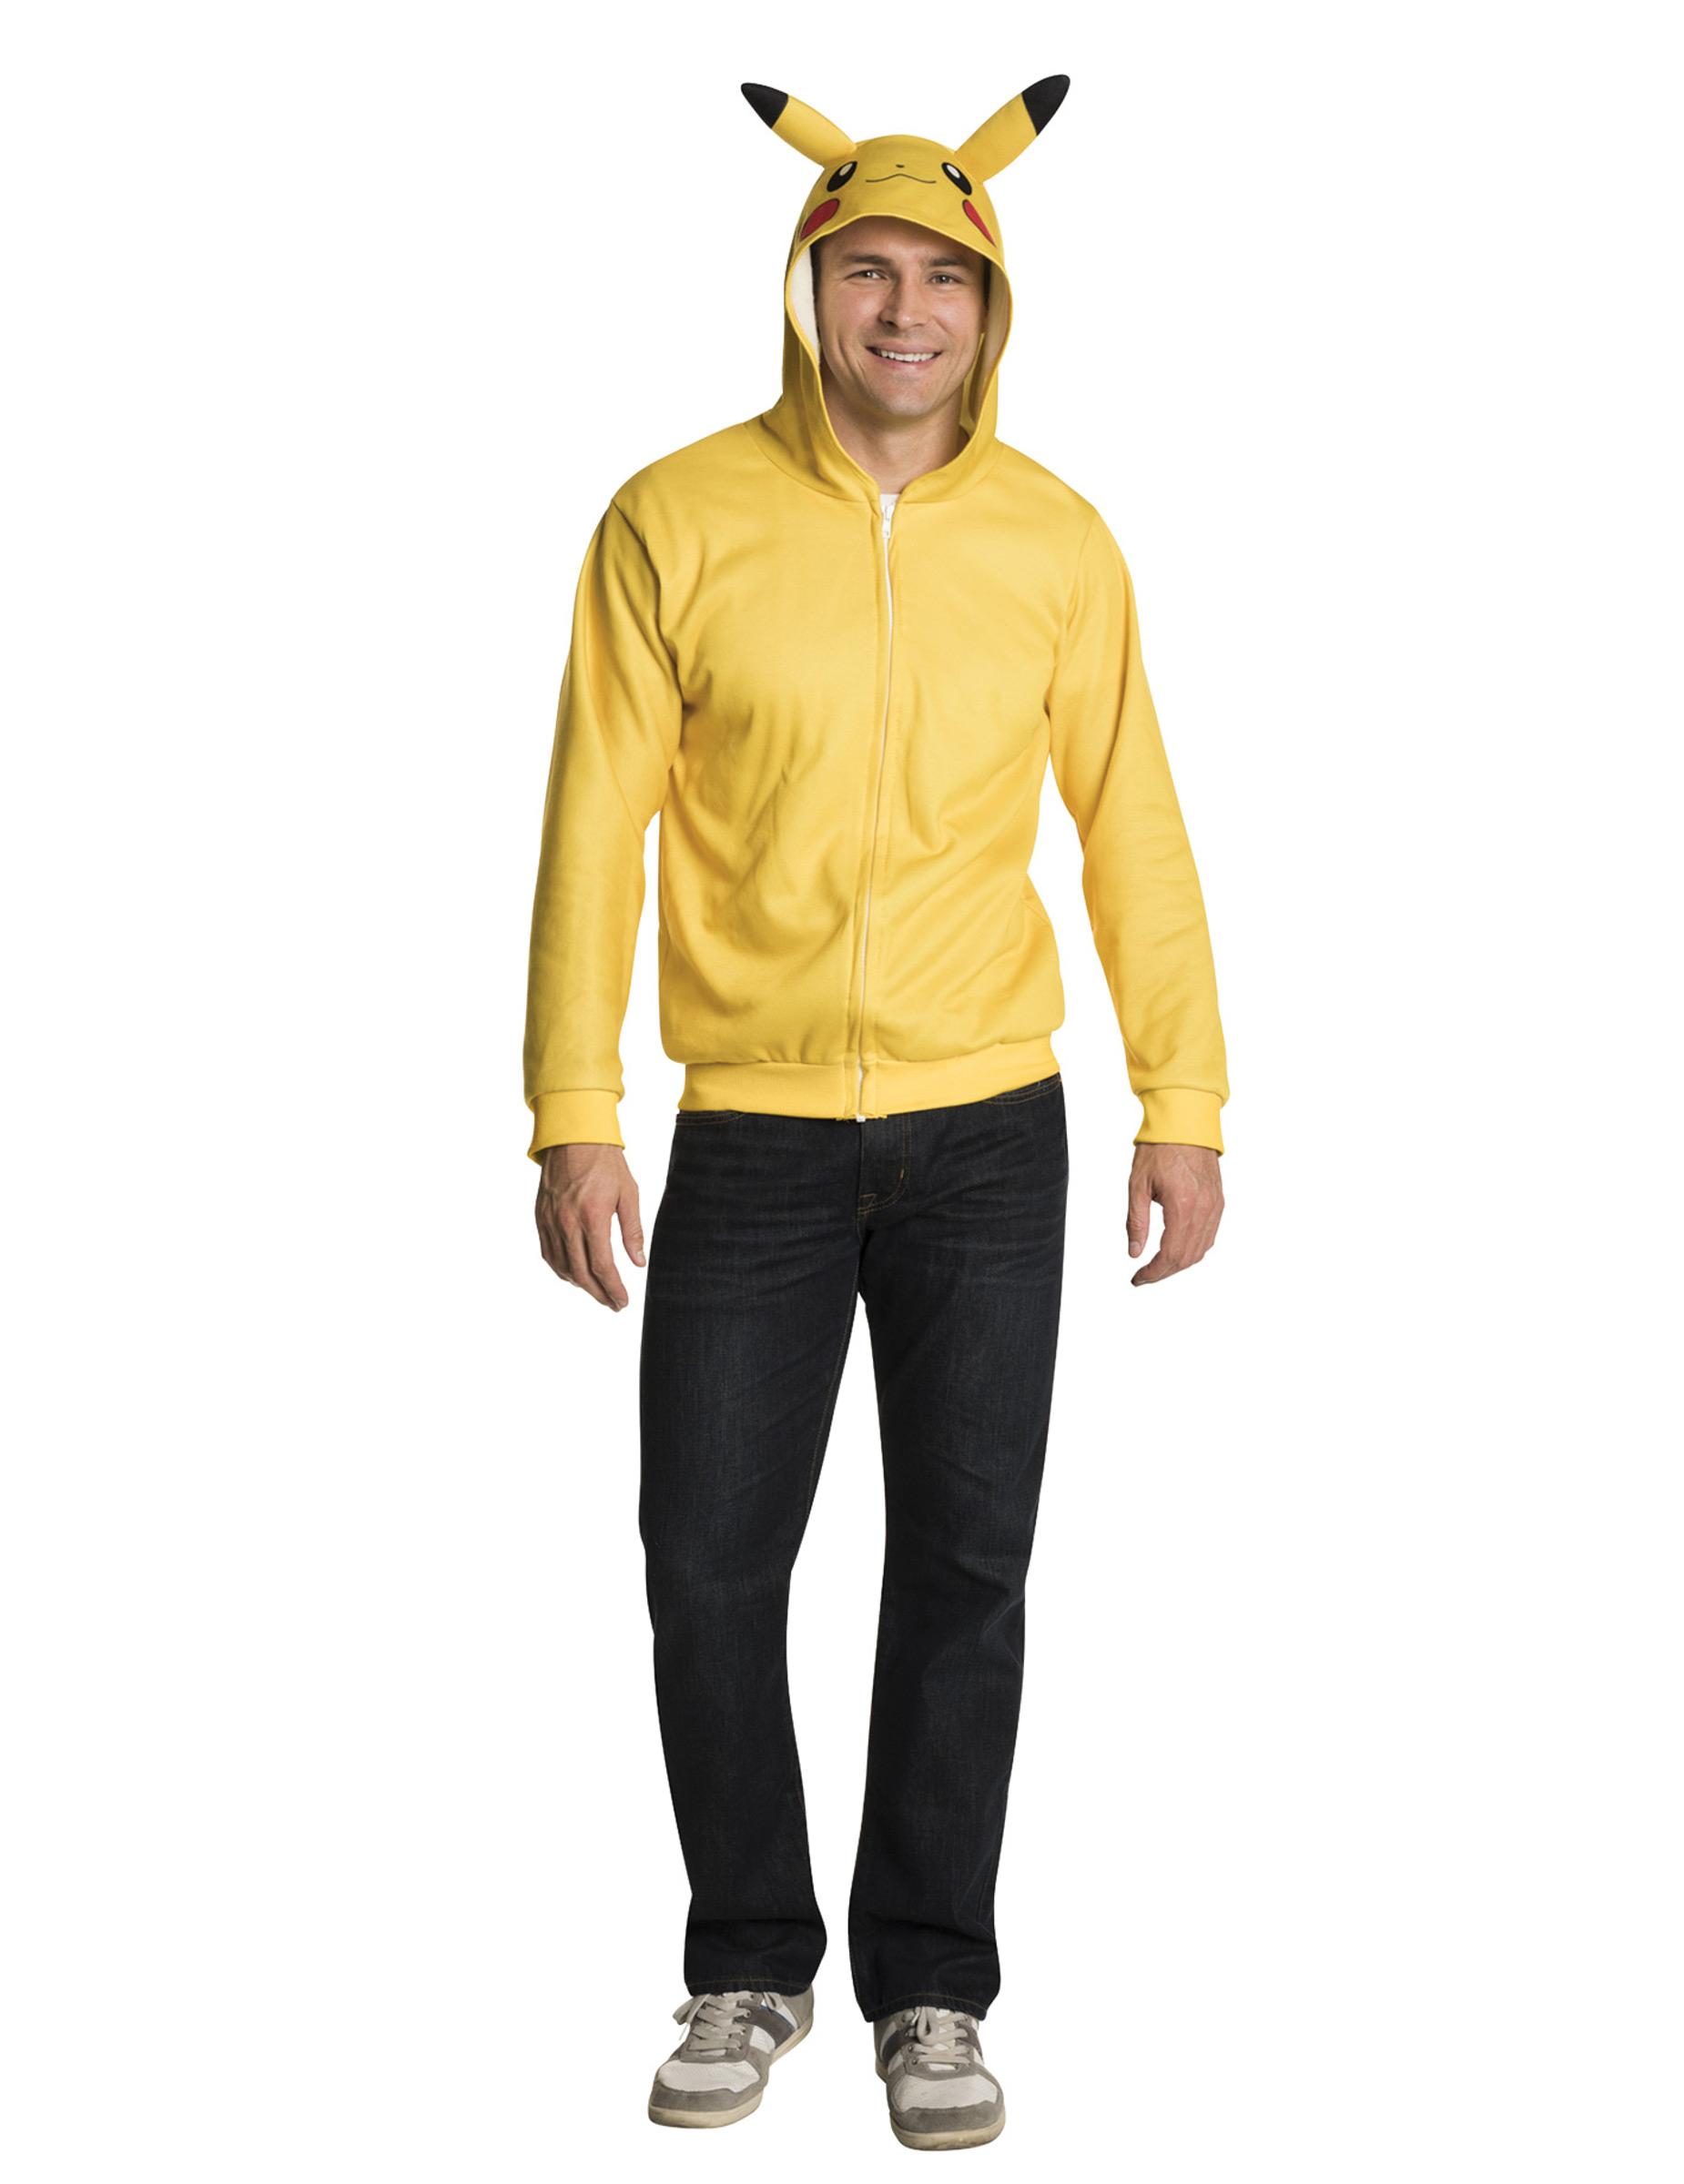 Disfraz Pikachu de Pokmon para hombre Disfraces adultos